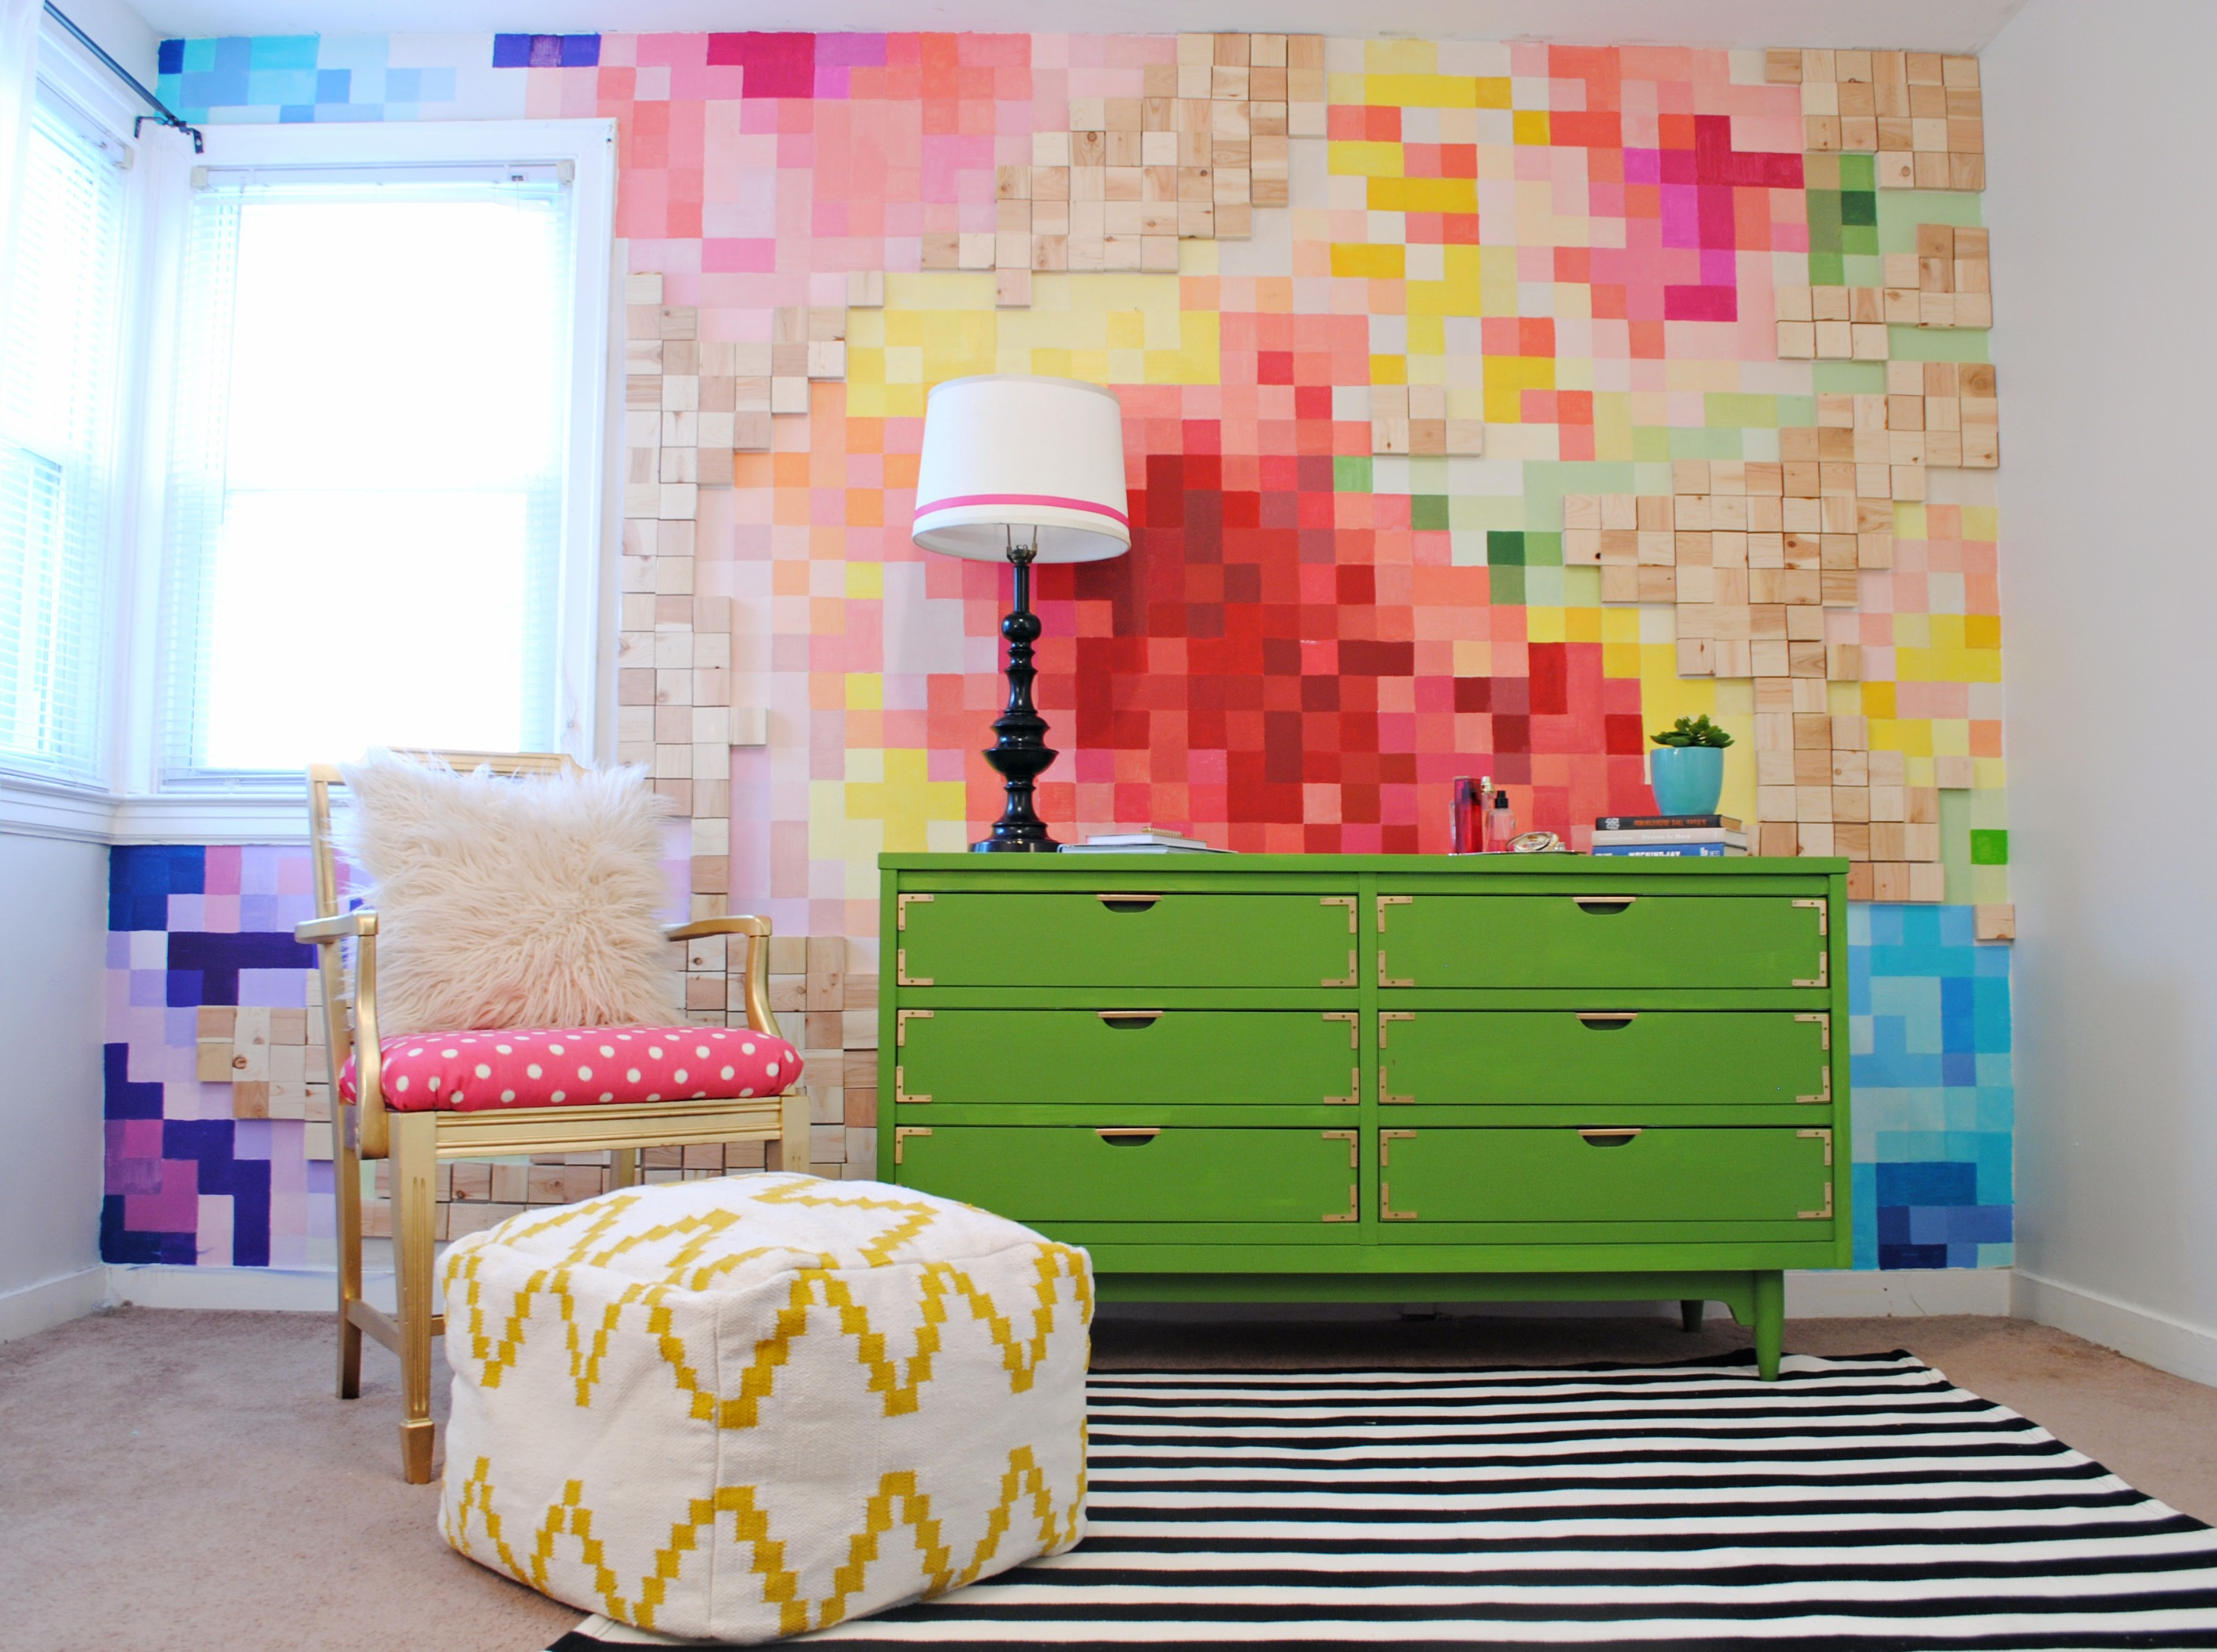 pixelated wall tutorial - Pixelated Interior Design